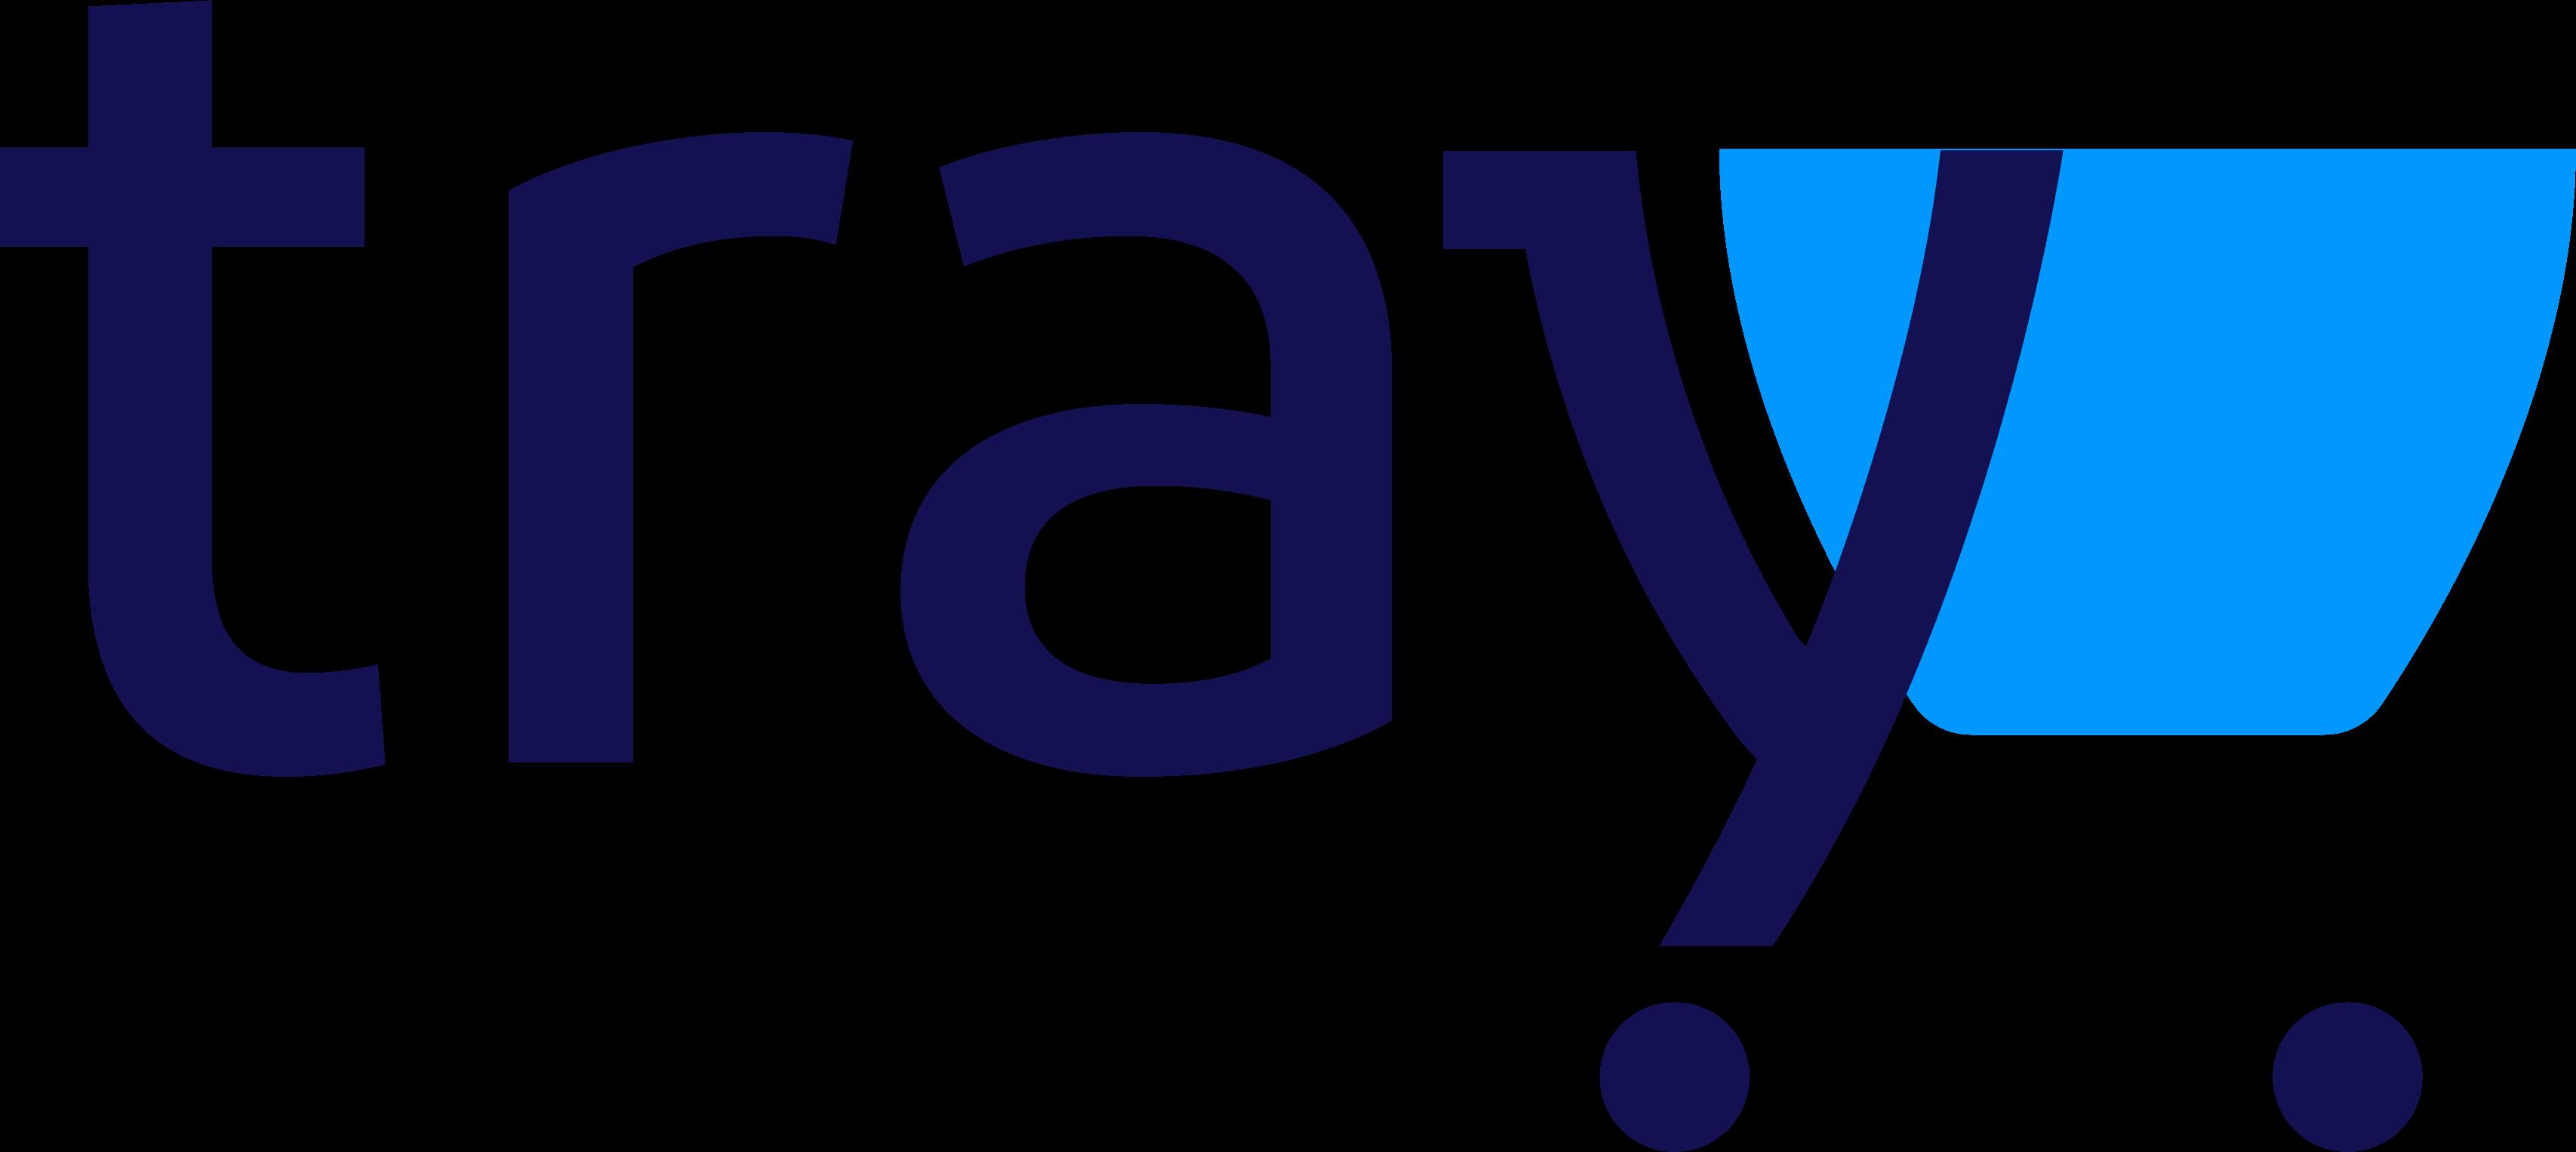 Tray plataforma